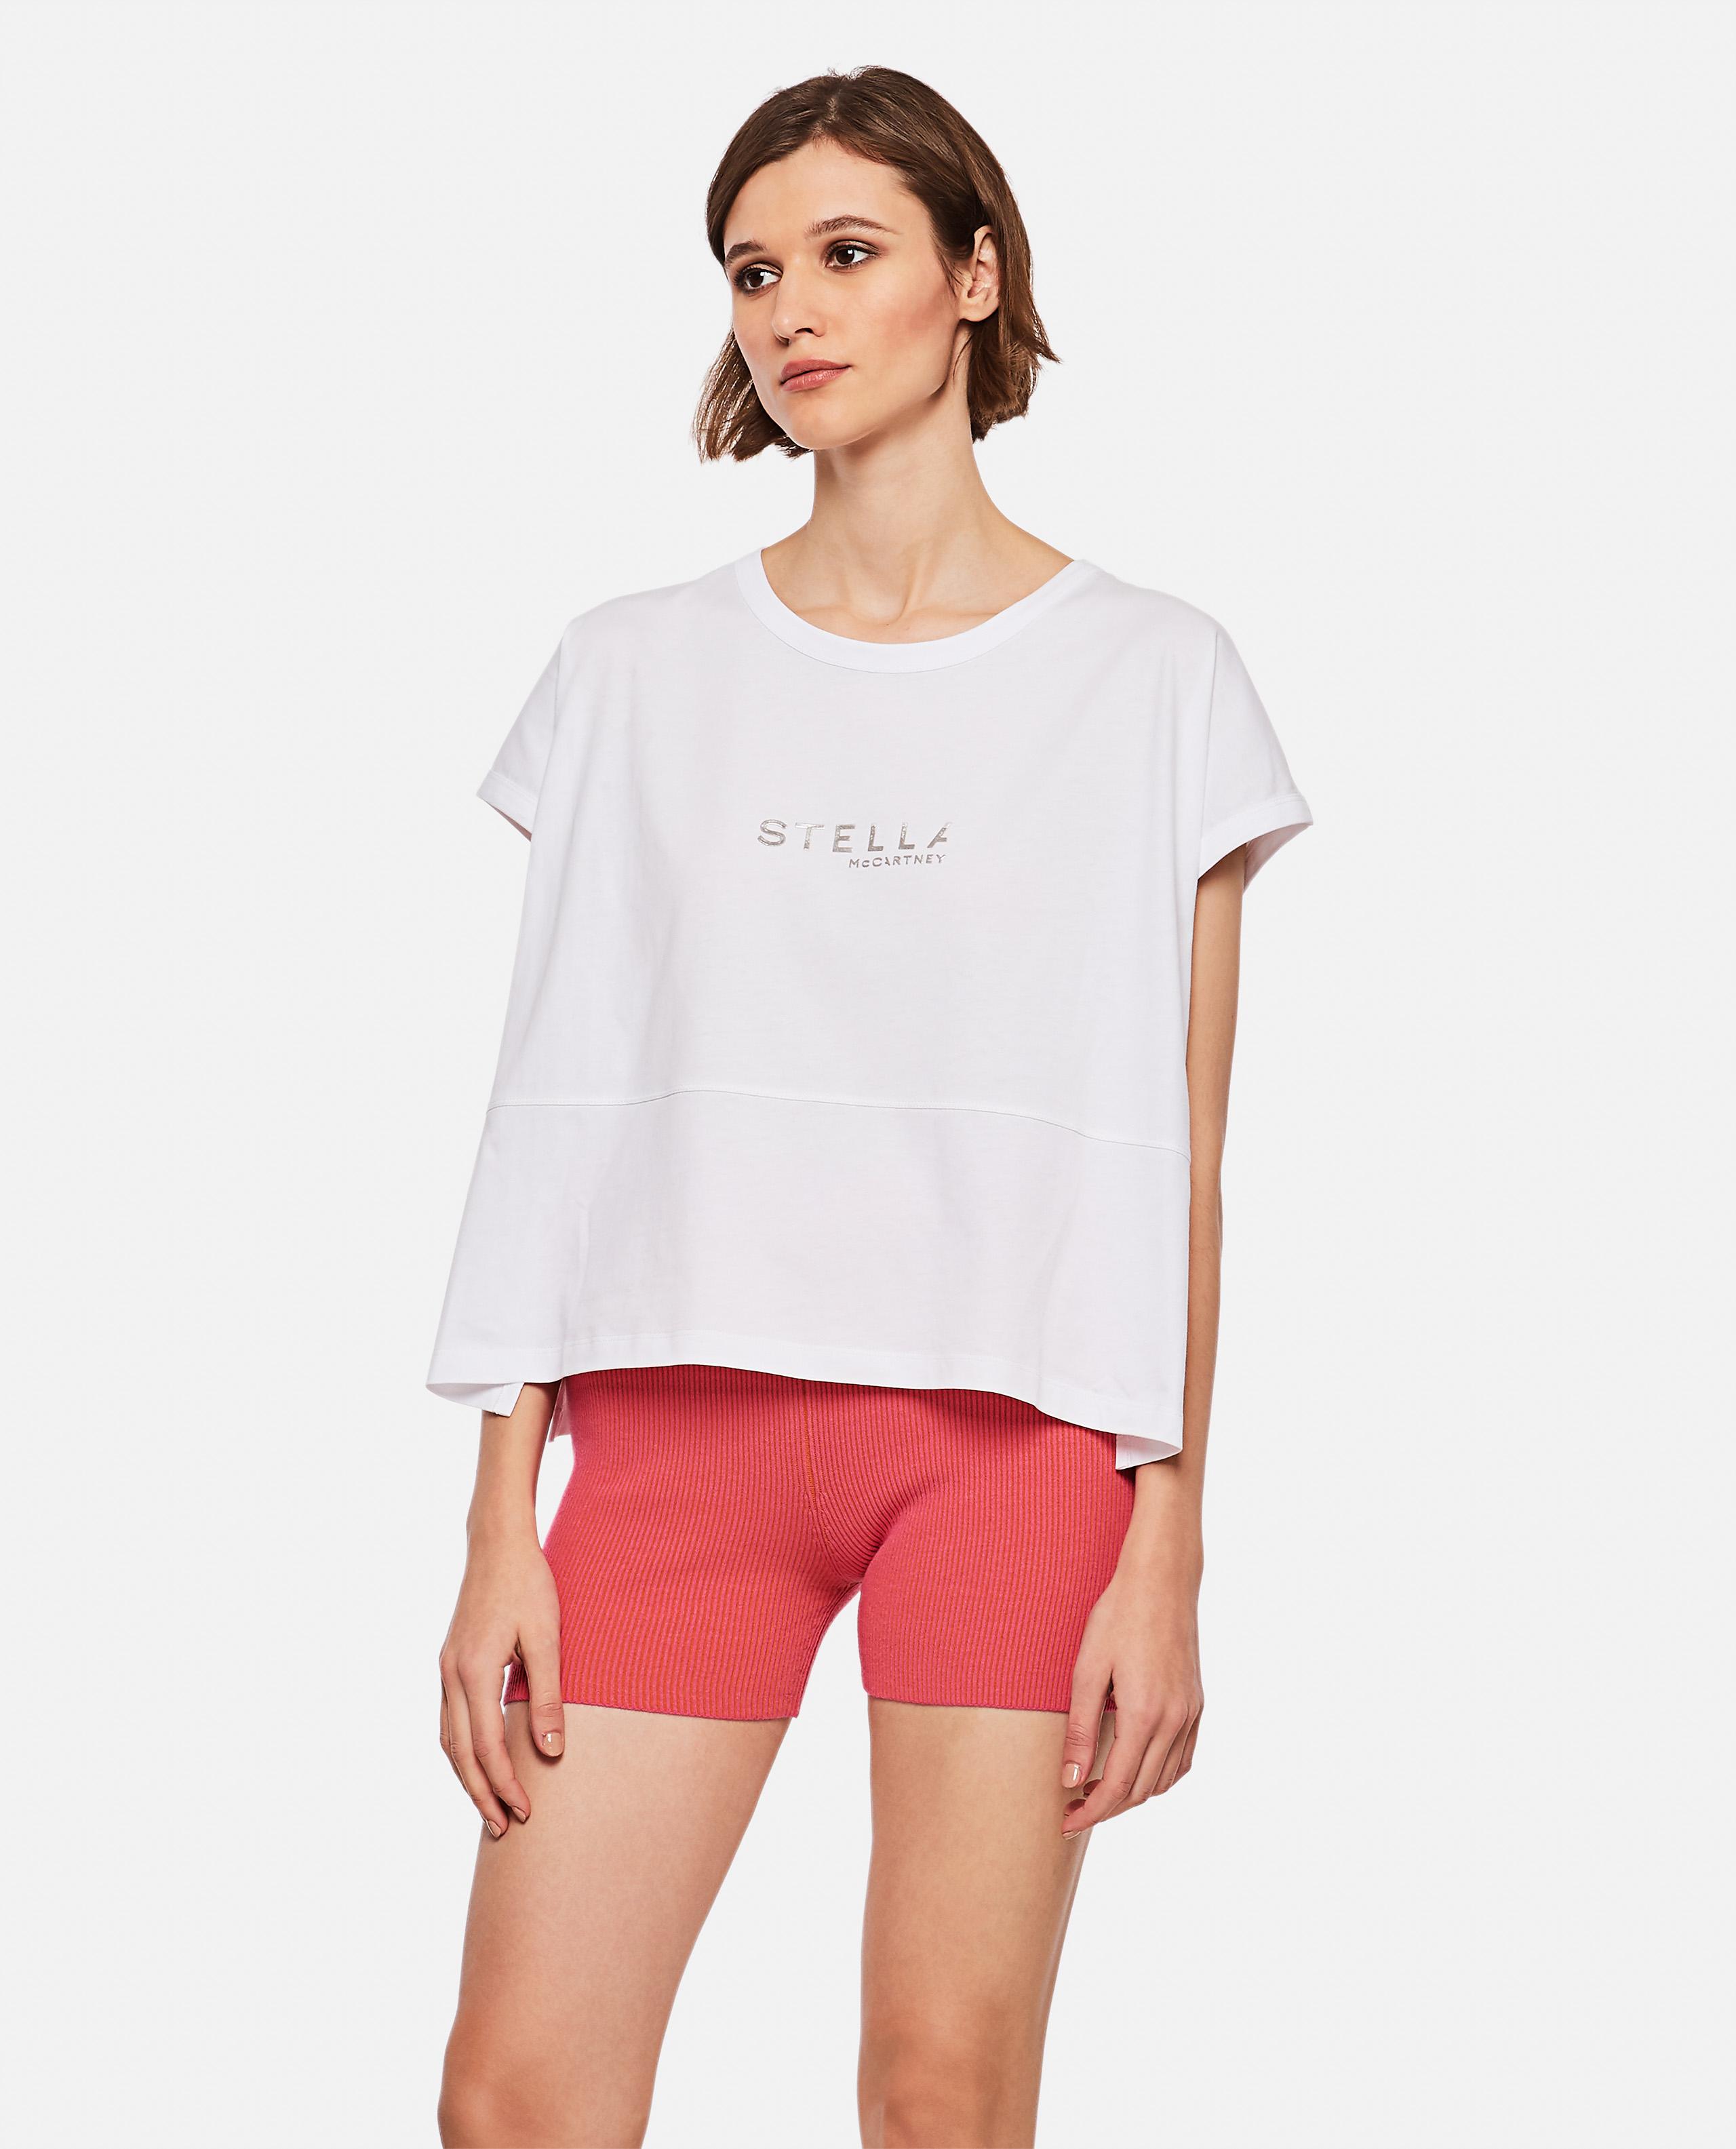 T-shirt with boxy logo